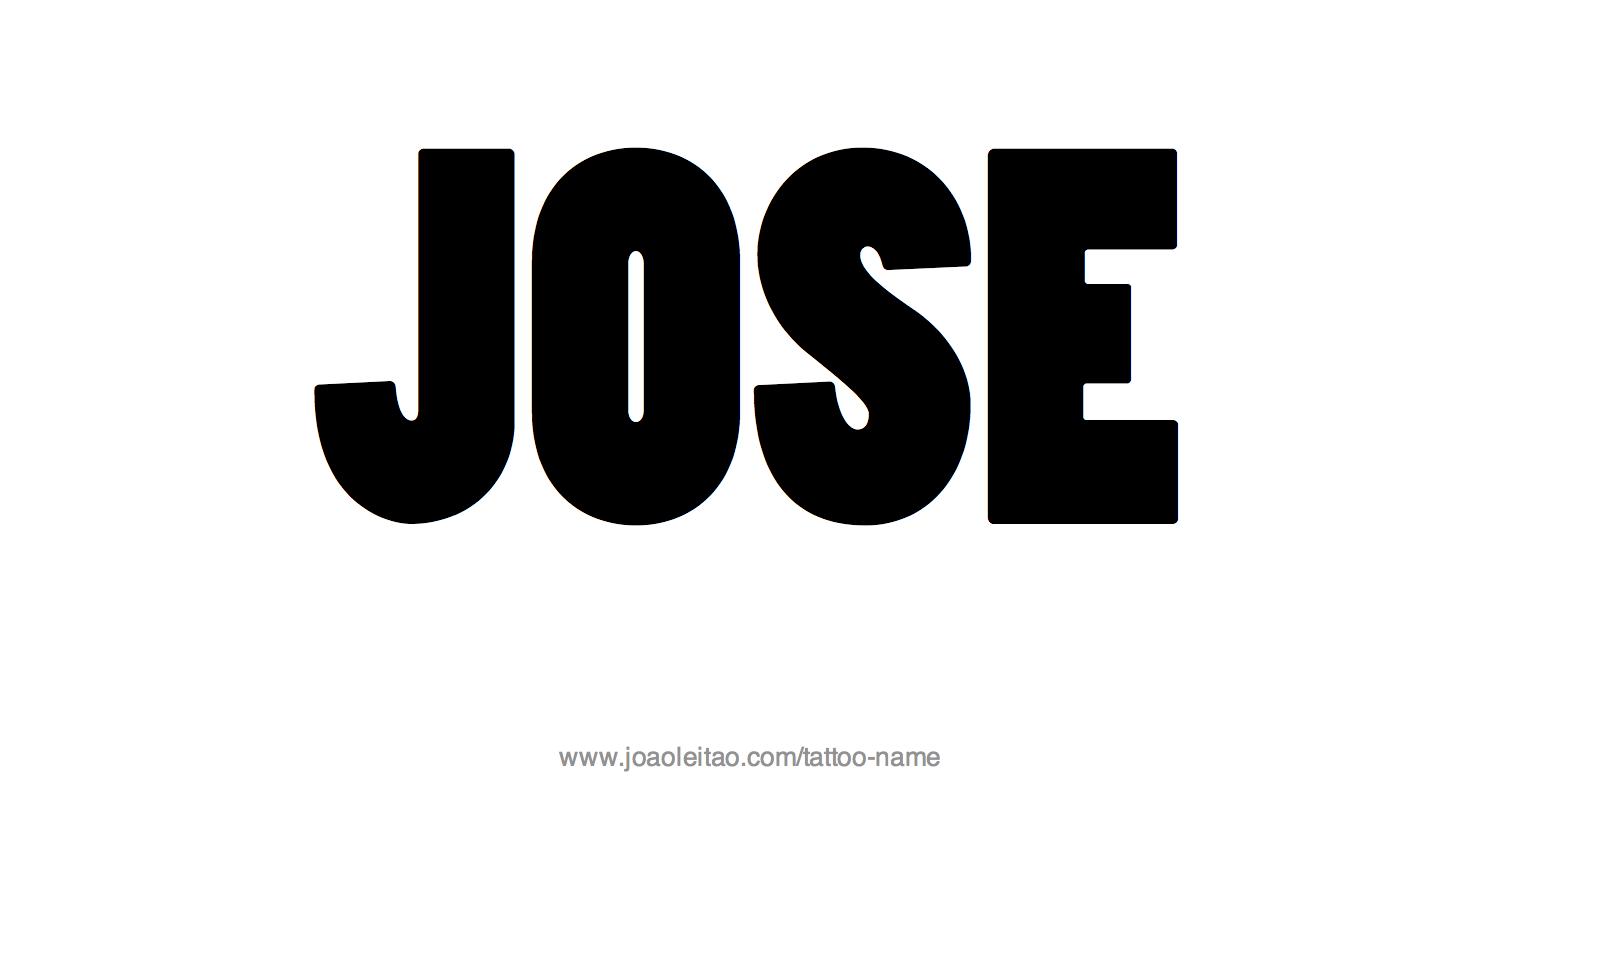 jose name tattoo designs